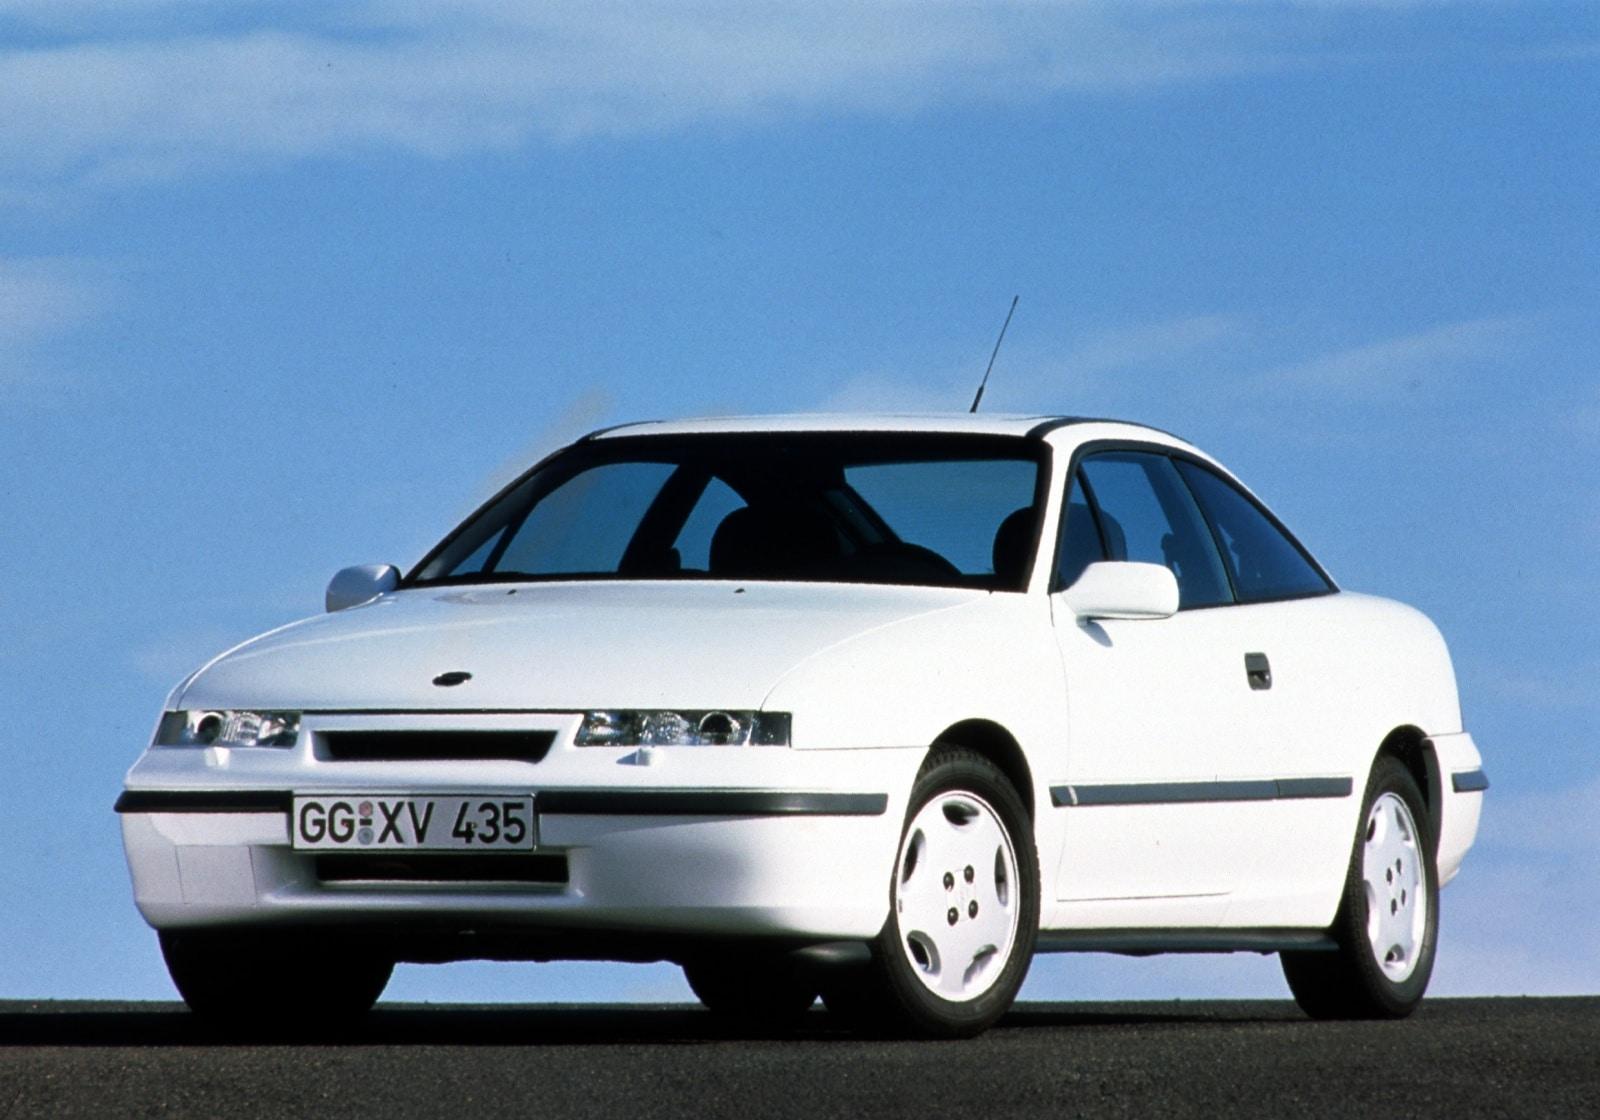 Vauxhall, Vauxhall Calibra, Vauxhall heritage, Calibra pre-facelift